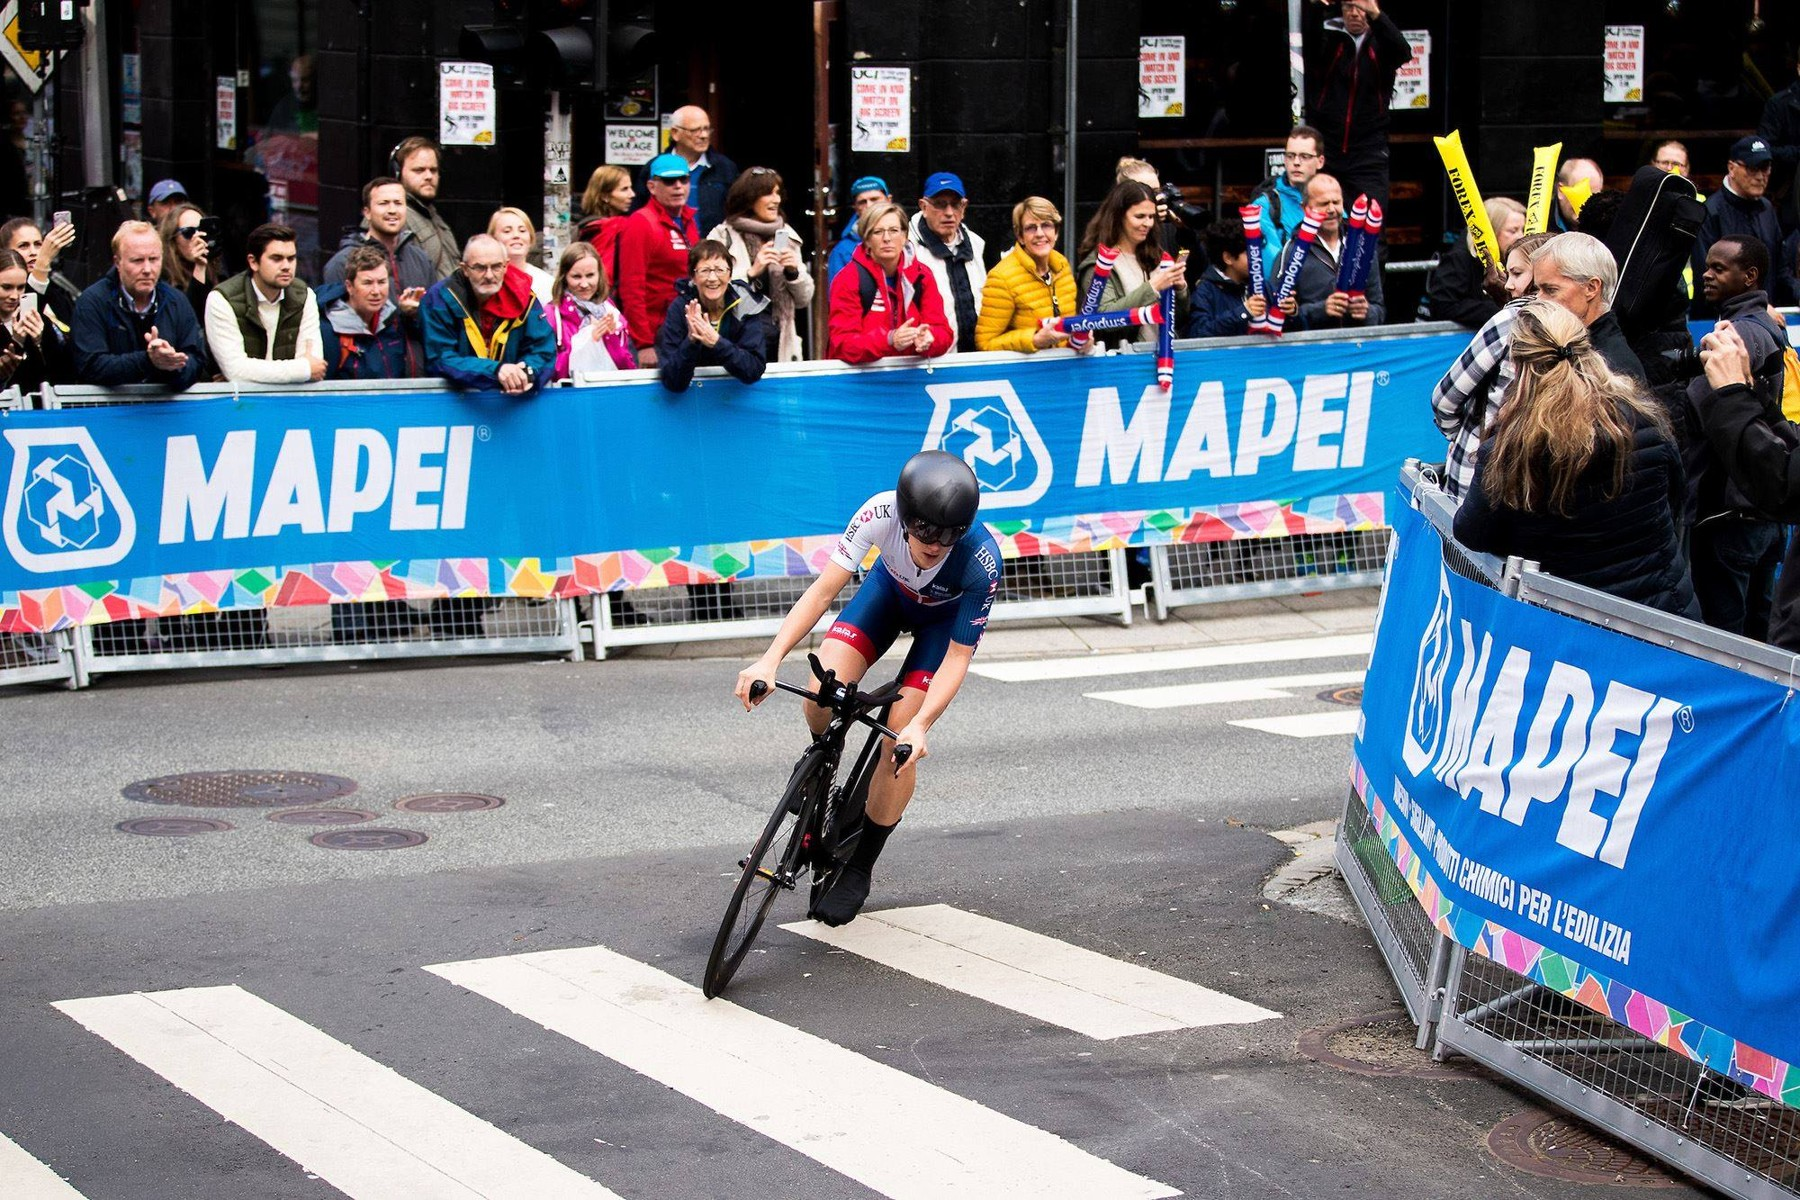 Sagan-mapei-uci-championship (1)